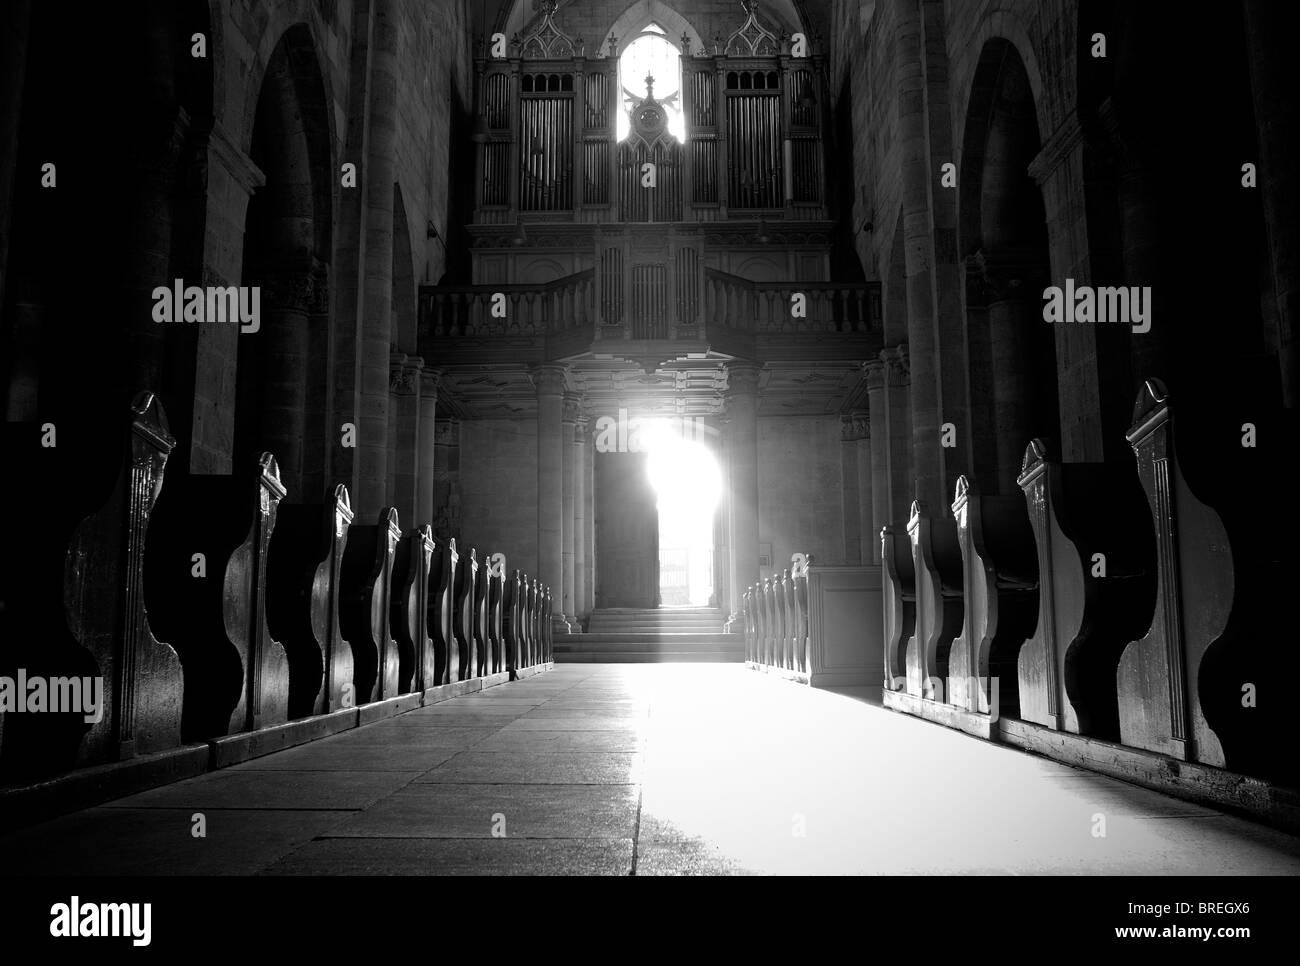 Romania, Transylvania Alba Iulia church - Stock Image